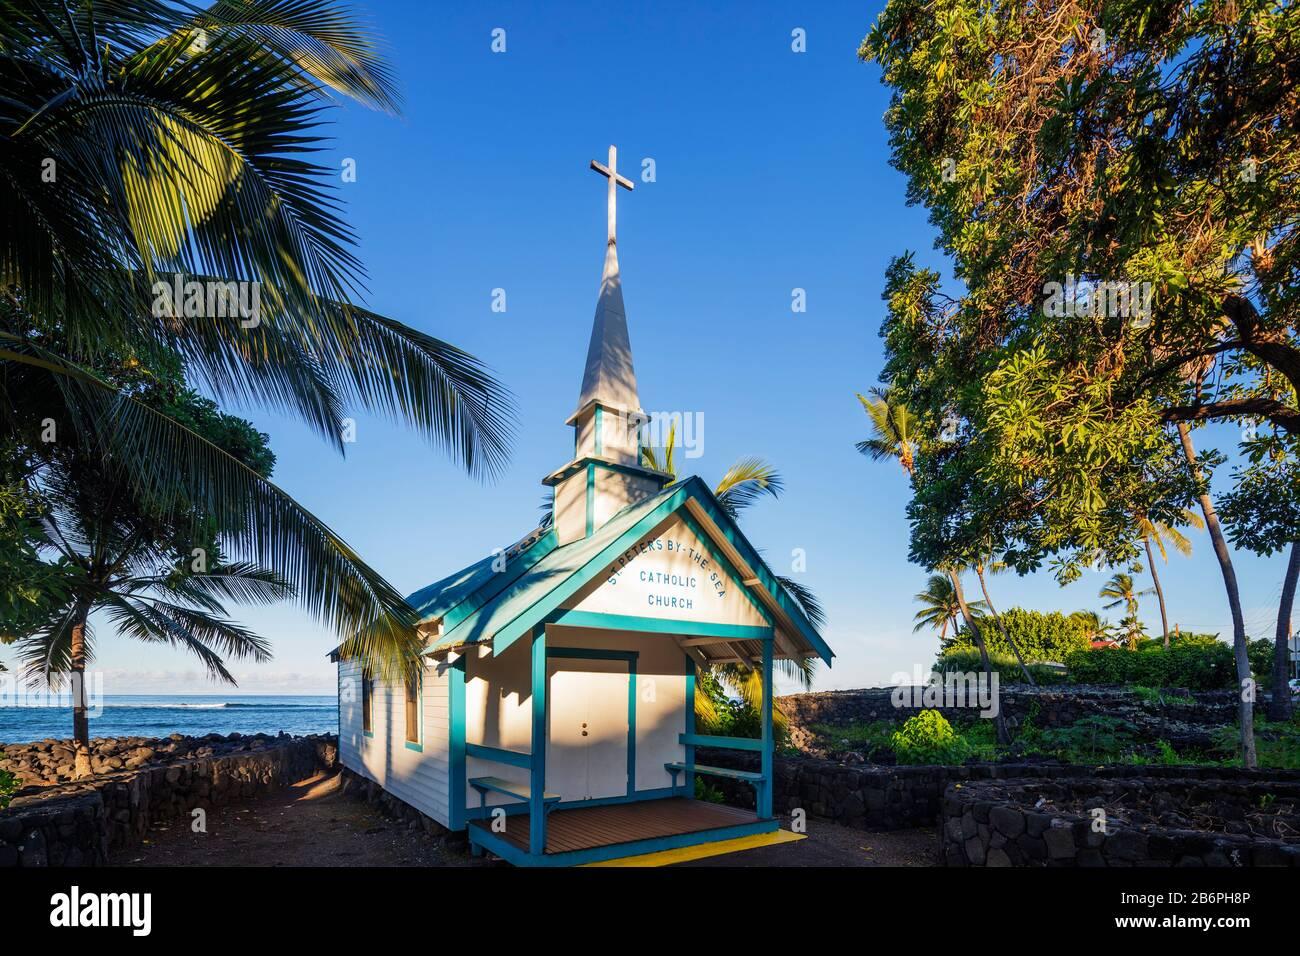 USA, Hawaii, Big Island, Kona, St Peter's by the sea  Catholic church Stock Photo